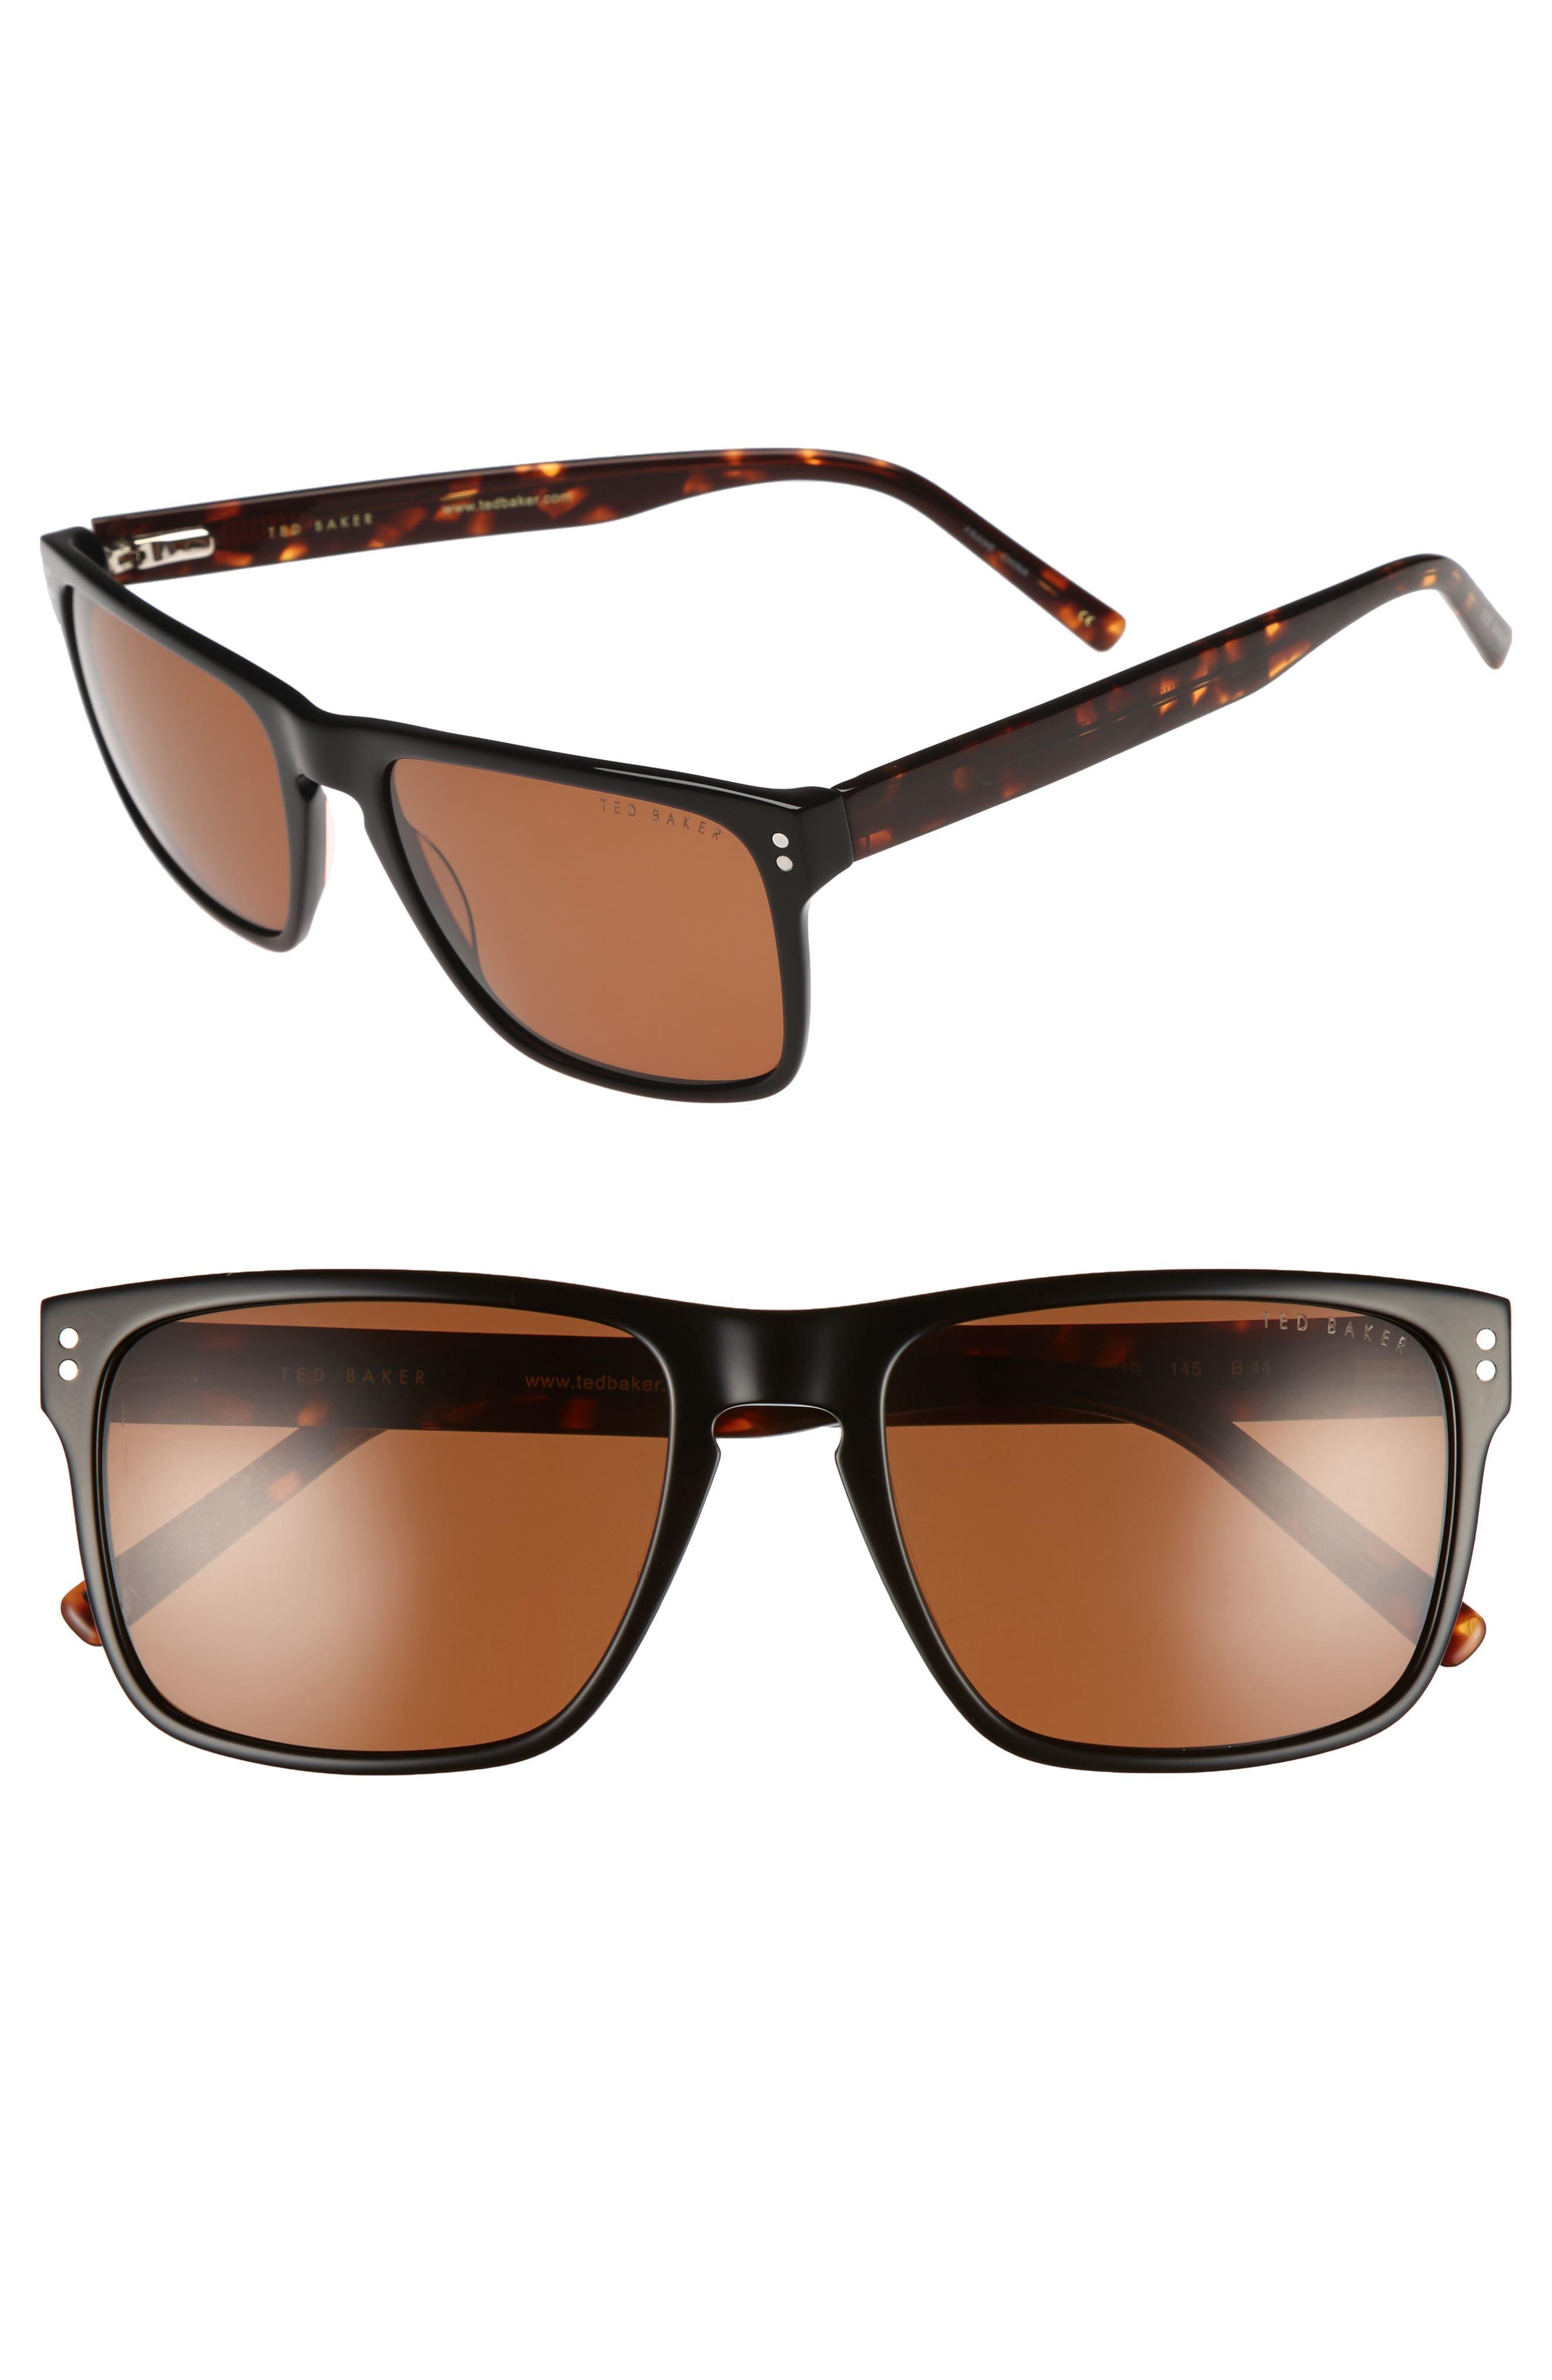 Alternate Image 1 Selected - Ted Baker London 56mm Polarized Rectangle Sunglasses